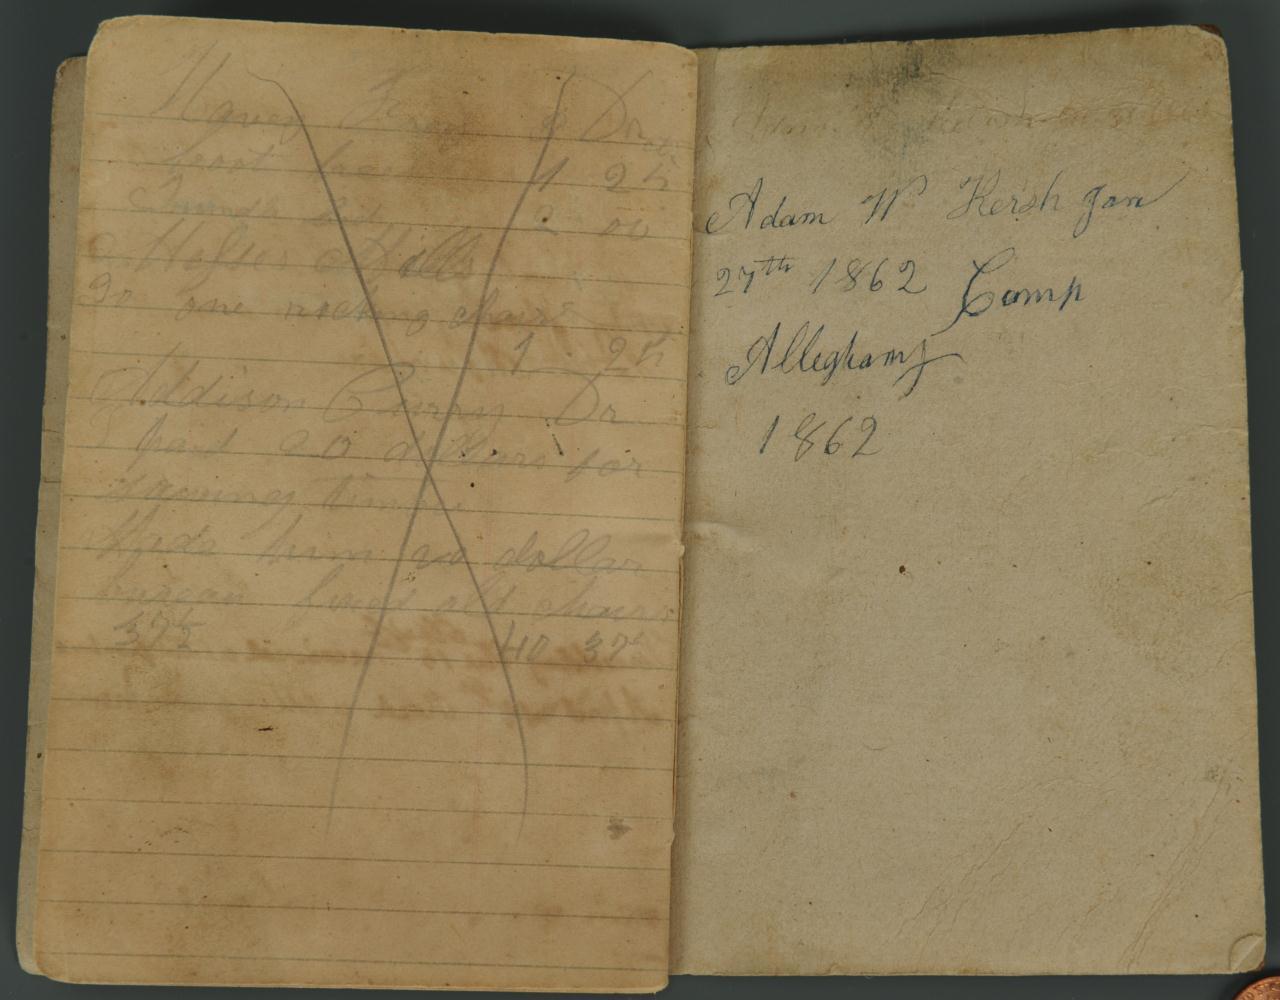 Lot 60: Confederate Dairy of Private Adam W. Kersh